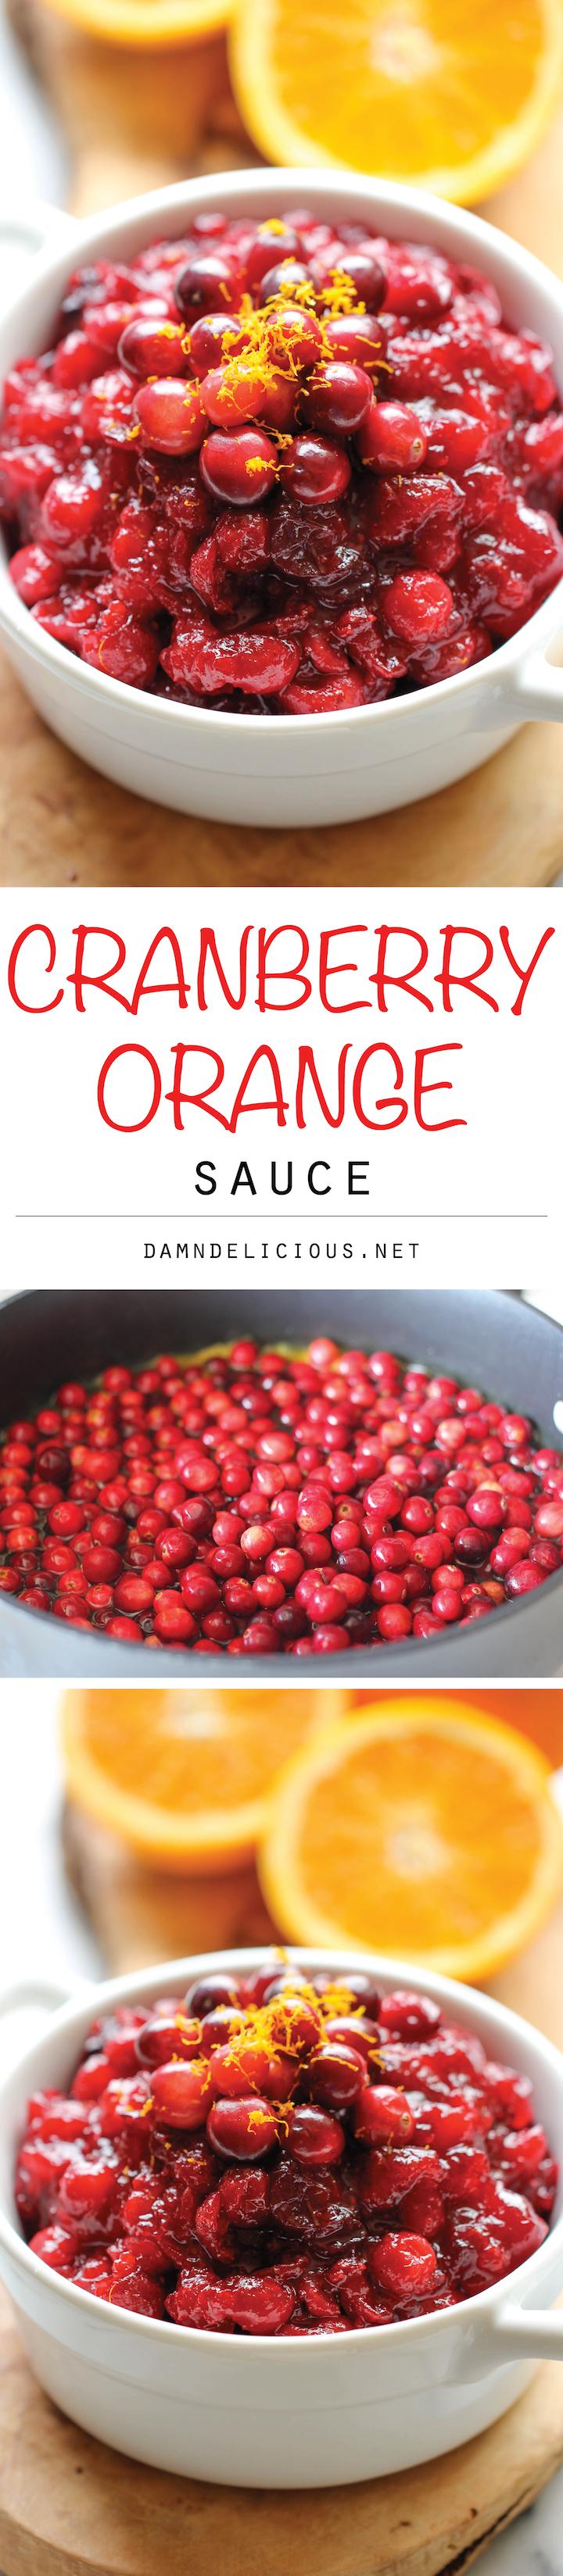 Cranberry Orange Sauce Damn Delicious